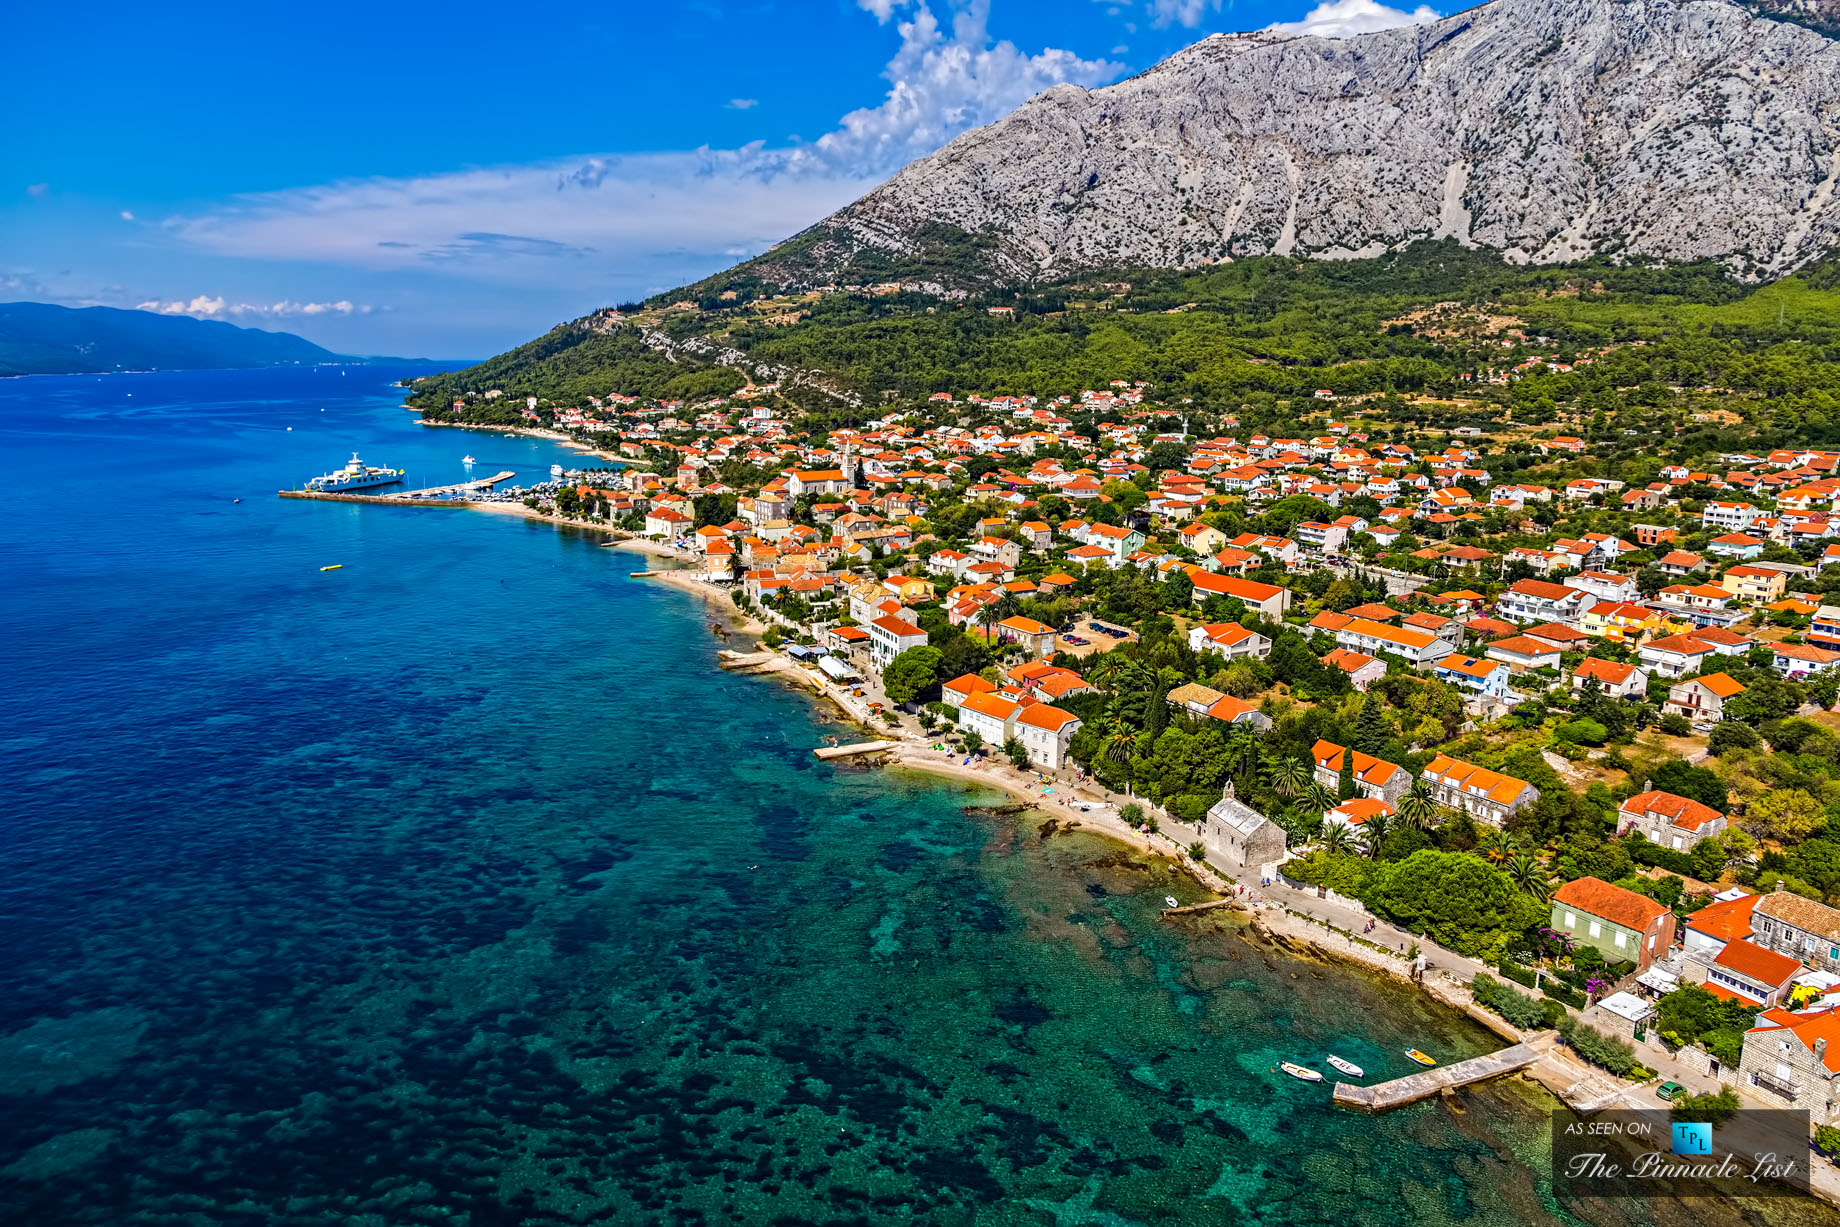 Croatia Orebic - Top 5 Secret Luxury Locations in Eastern Europe